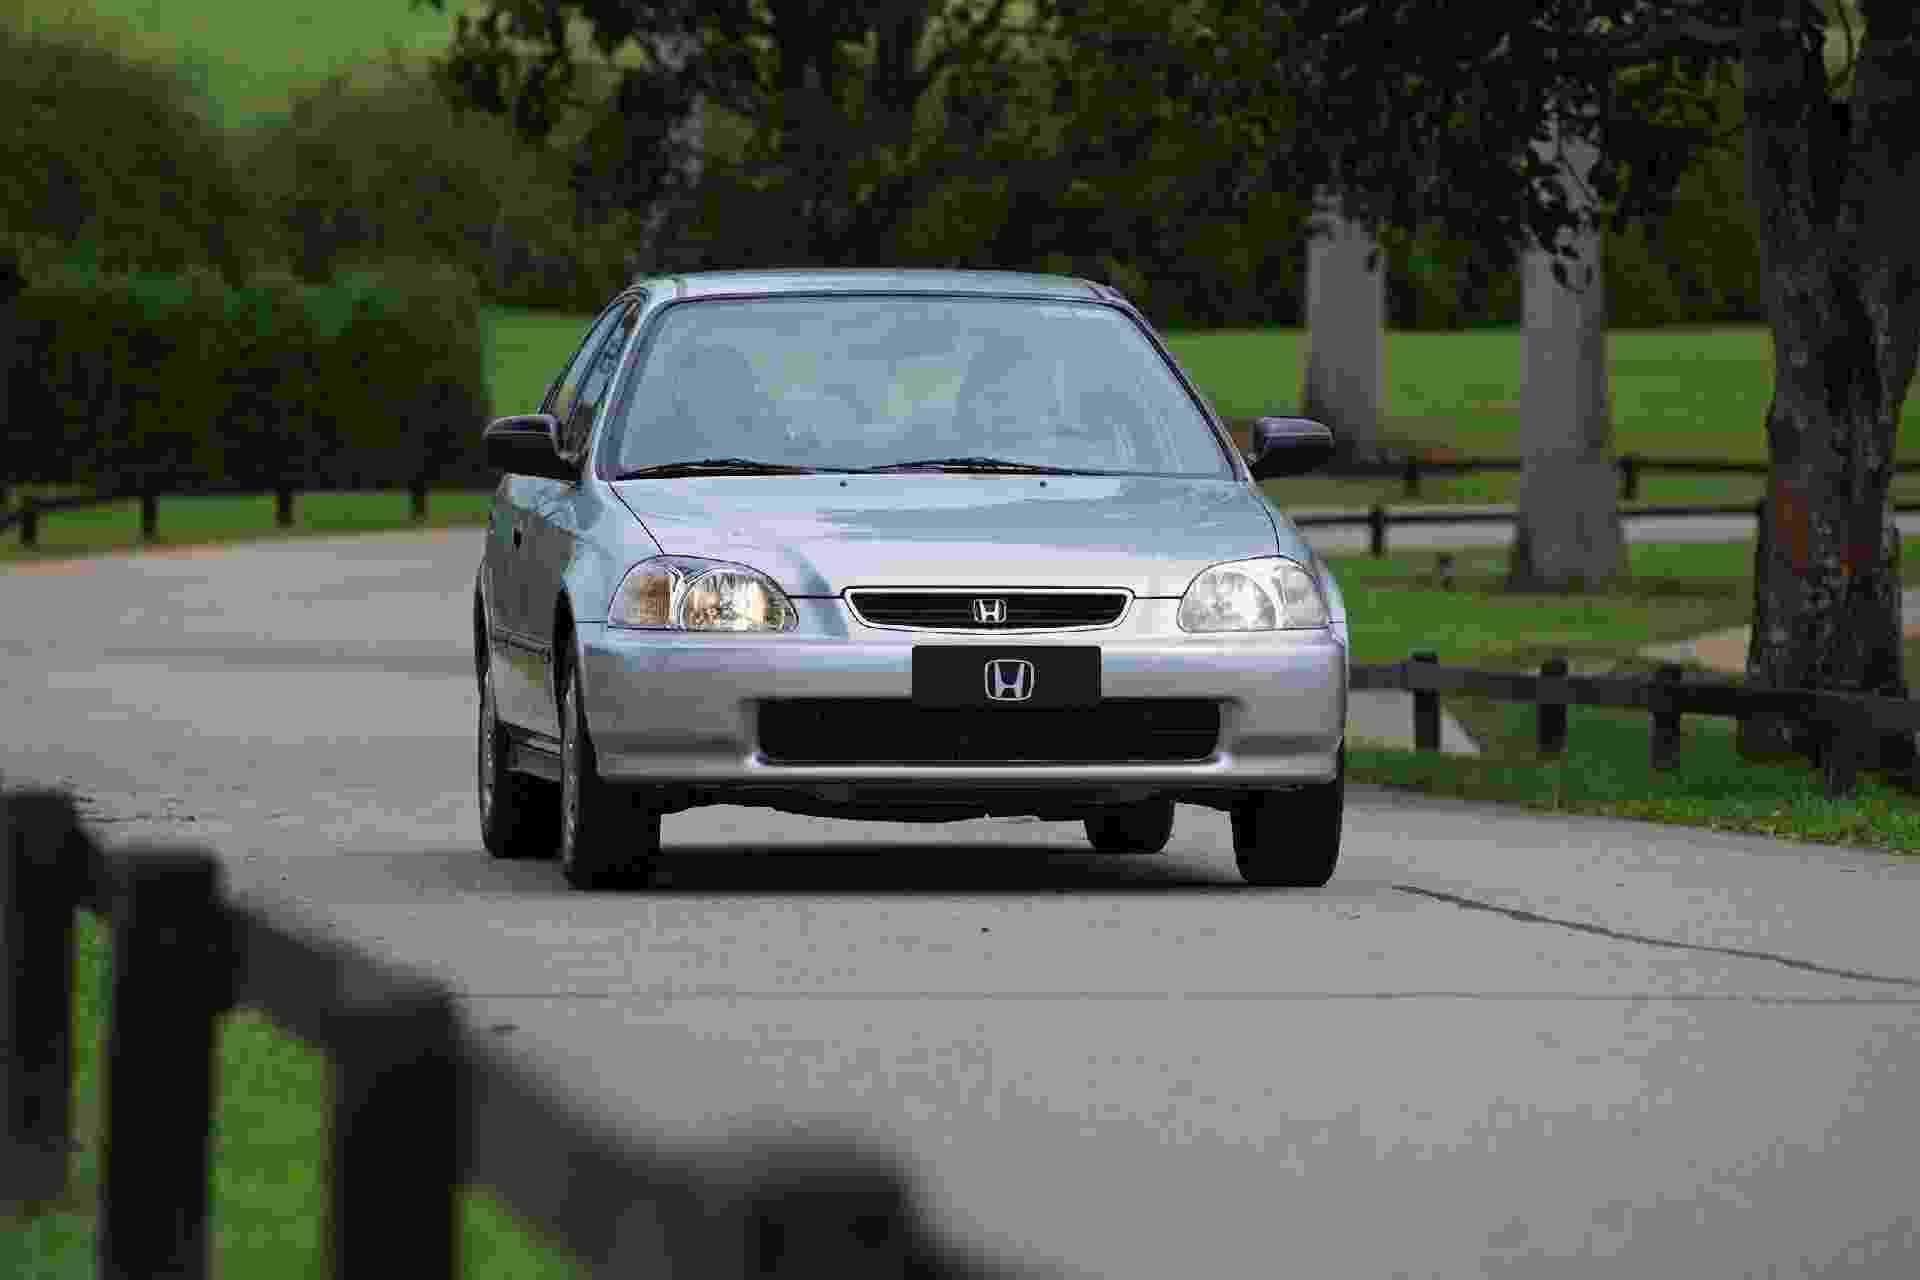 Honda Civic LX 1997 - Murilo Góes/UOL